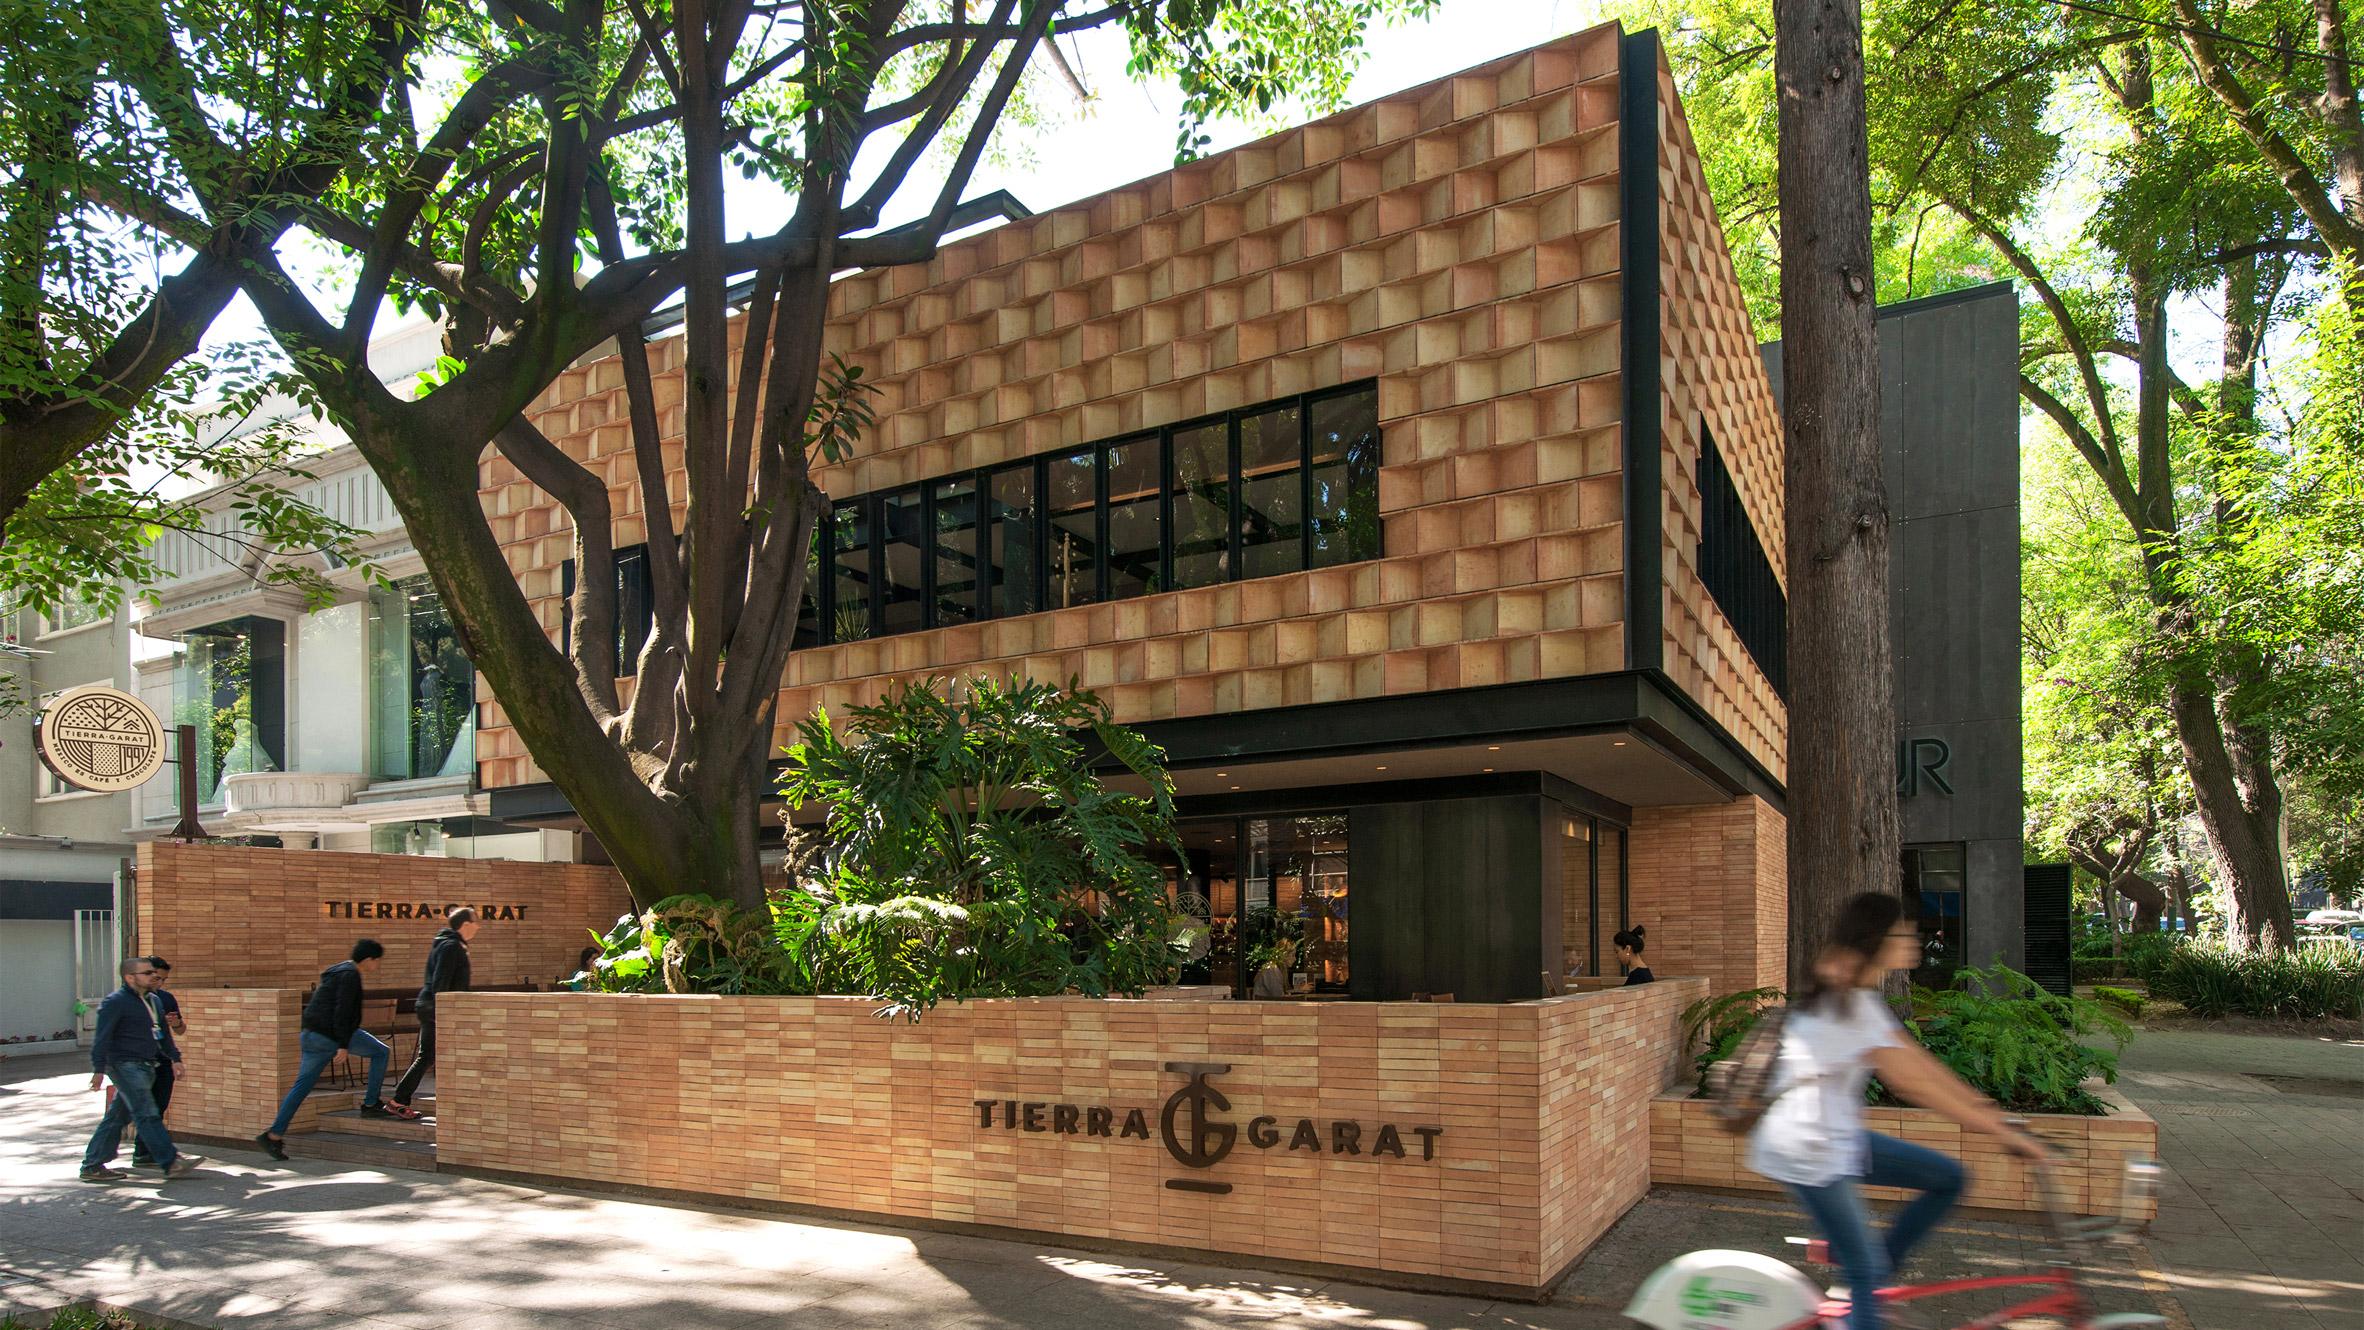 Tierra Garat by Esrawe studio